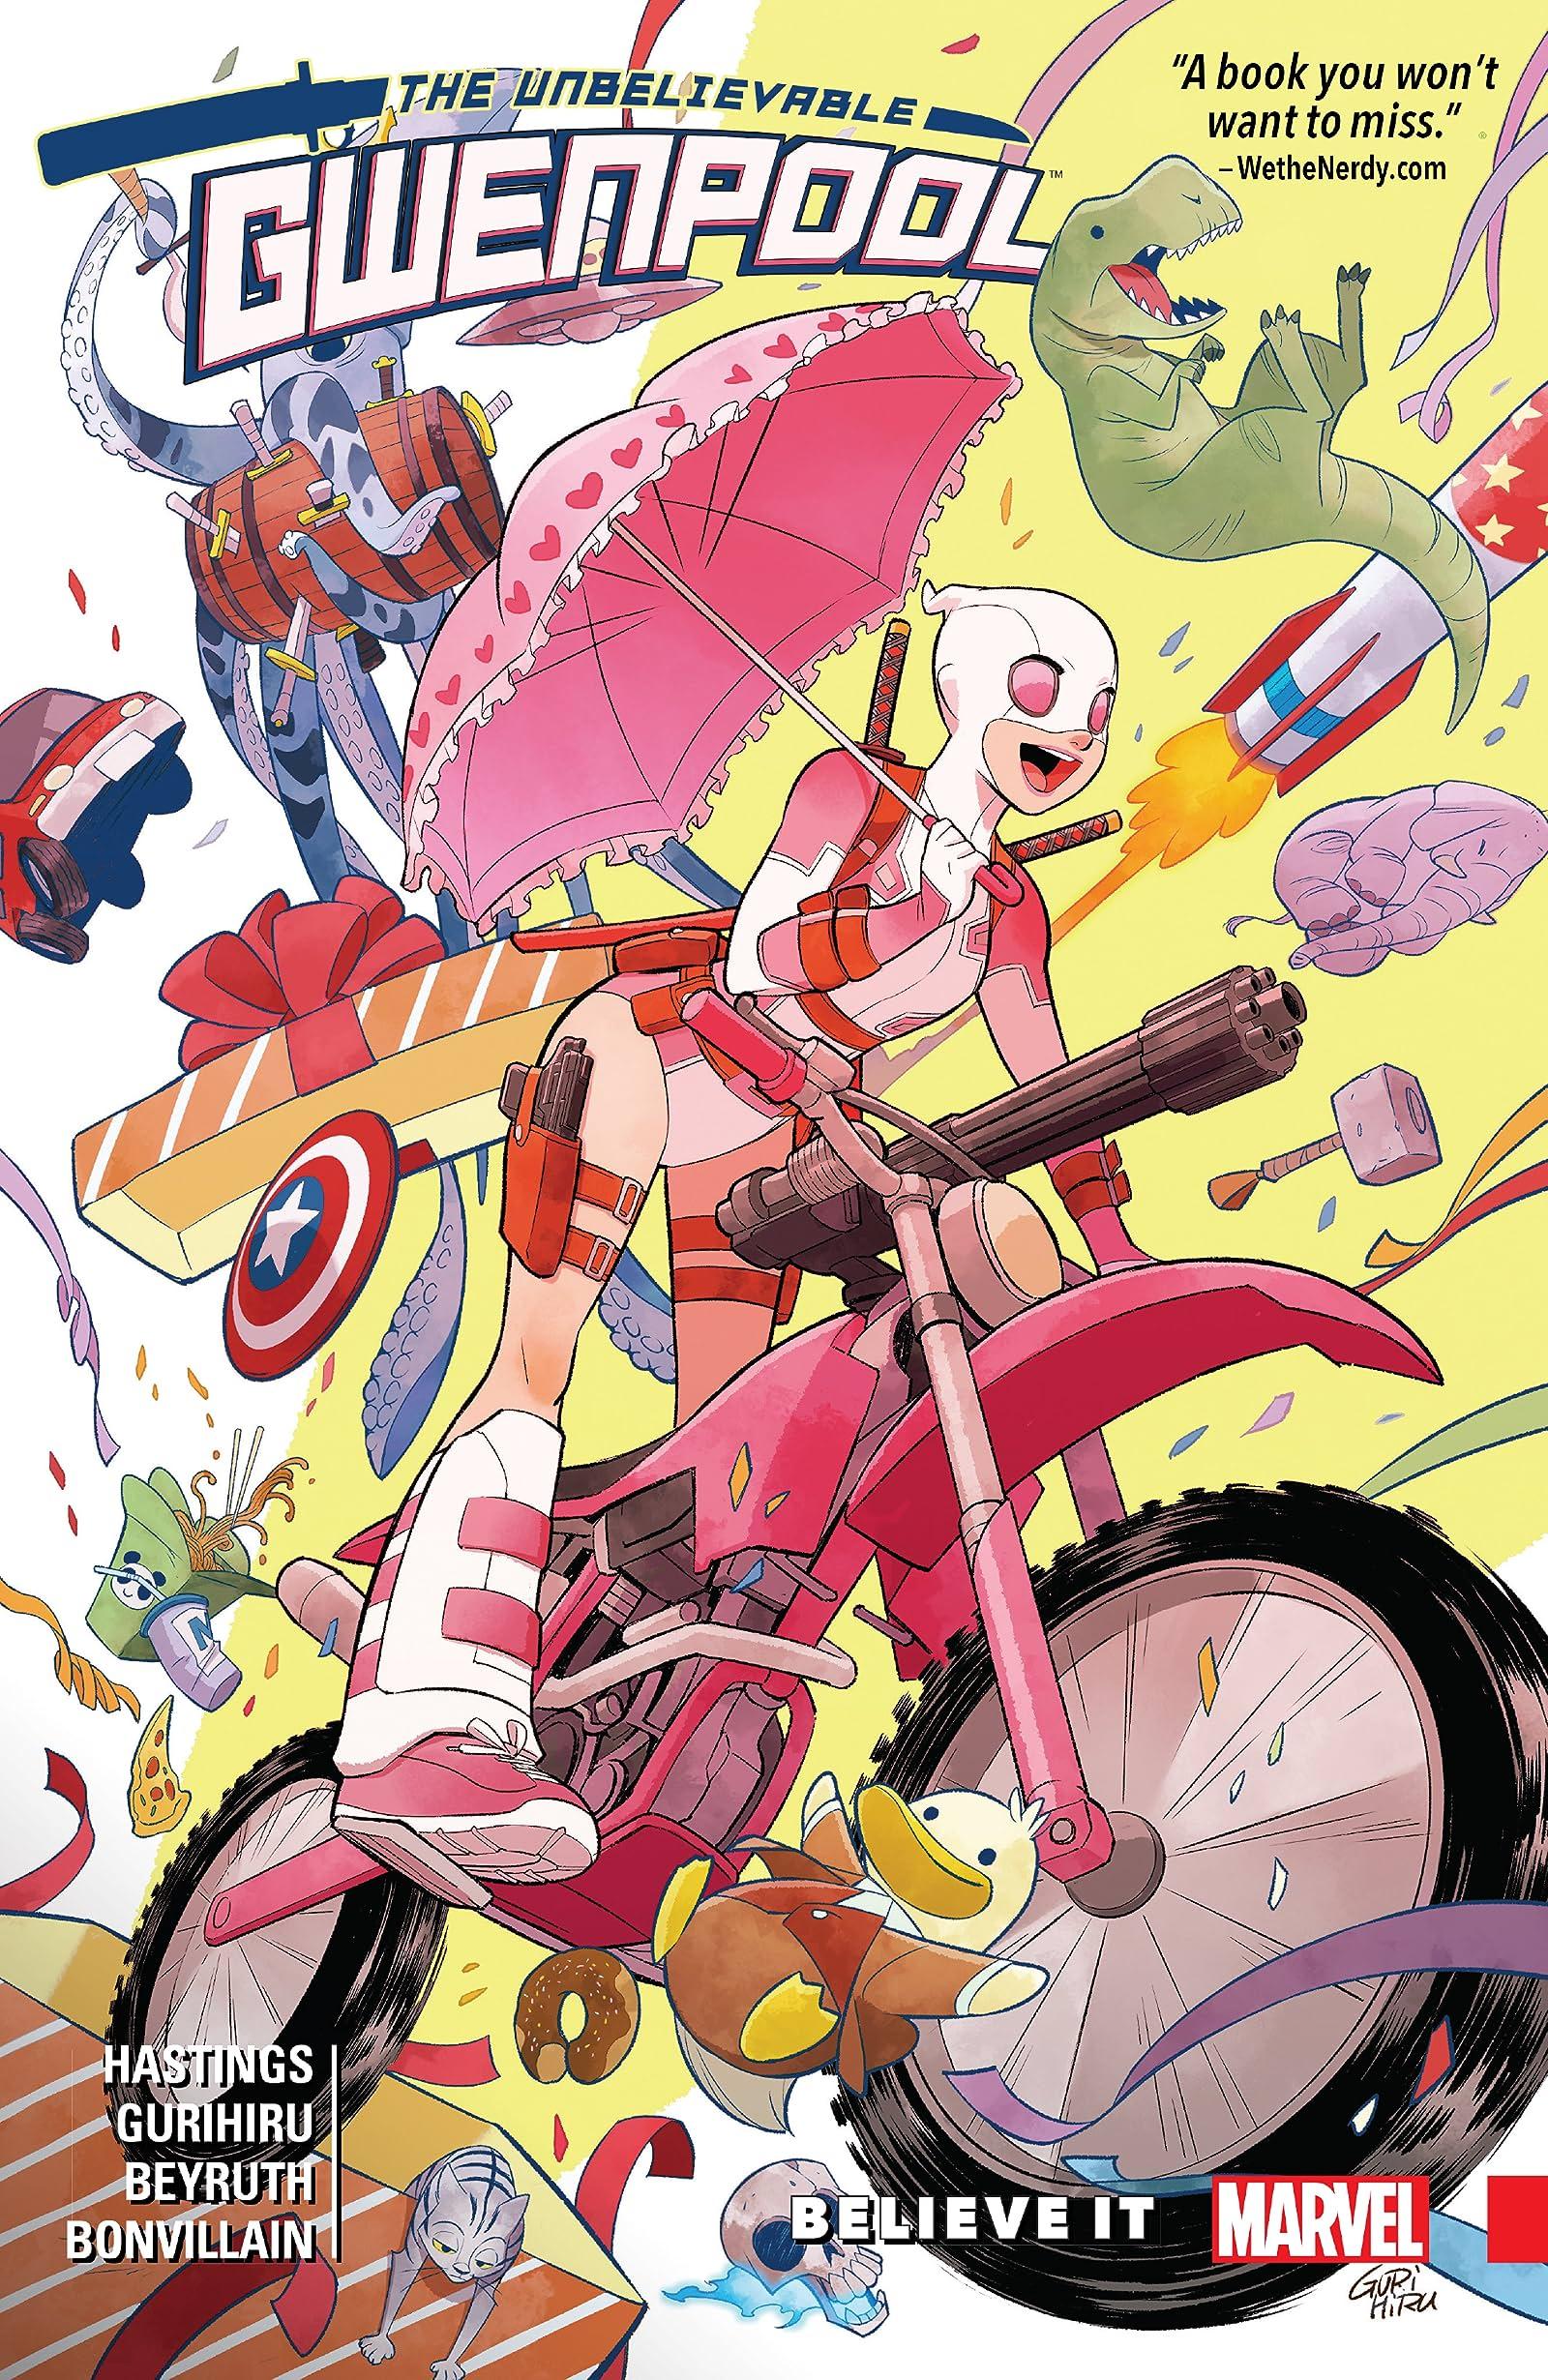 Gwenpool, The Unbelievable Vol  1: Believe It - (EU) Comics by comiXology